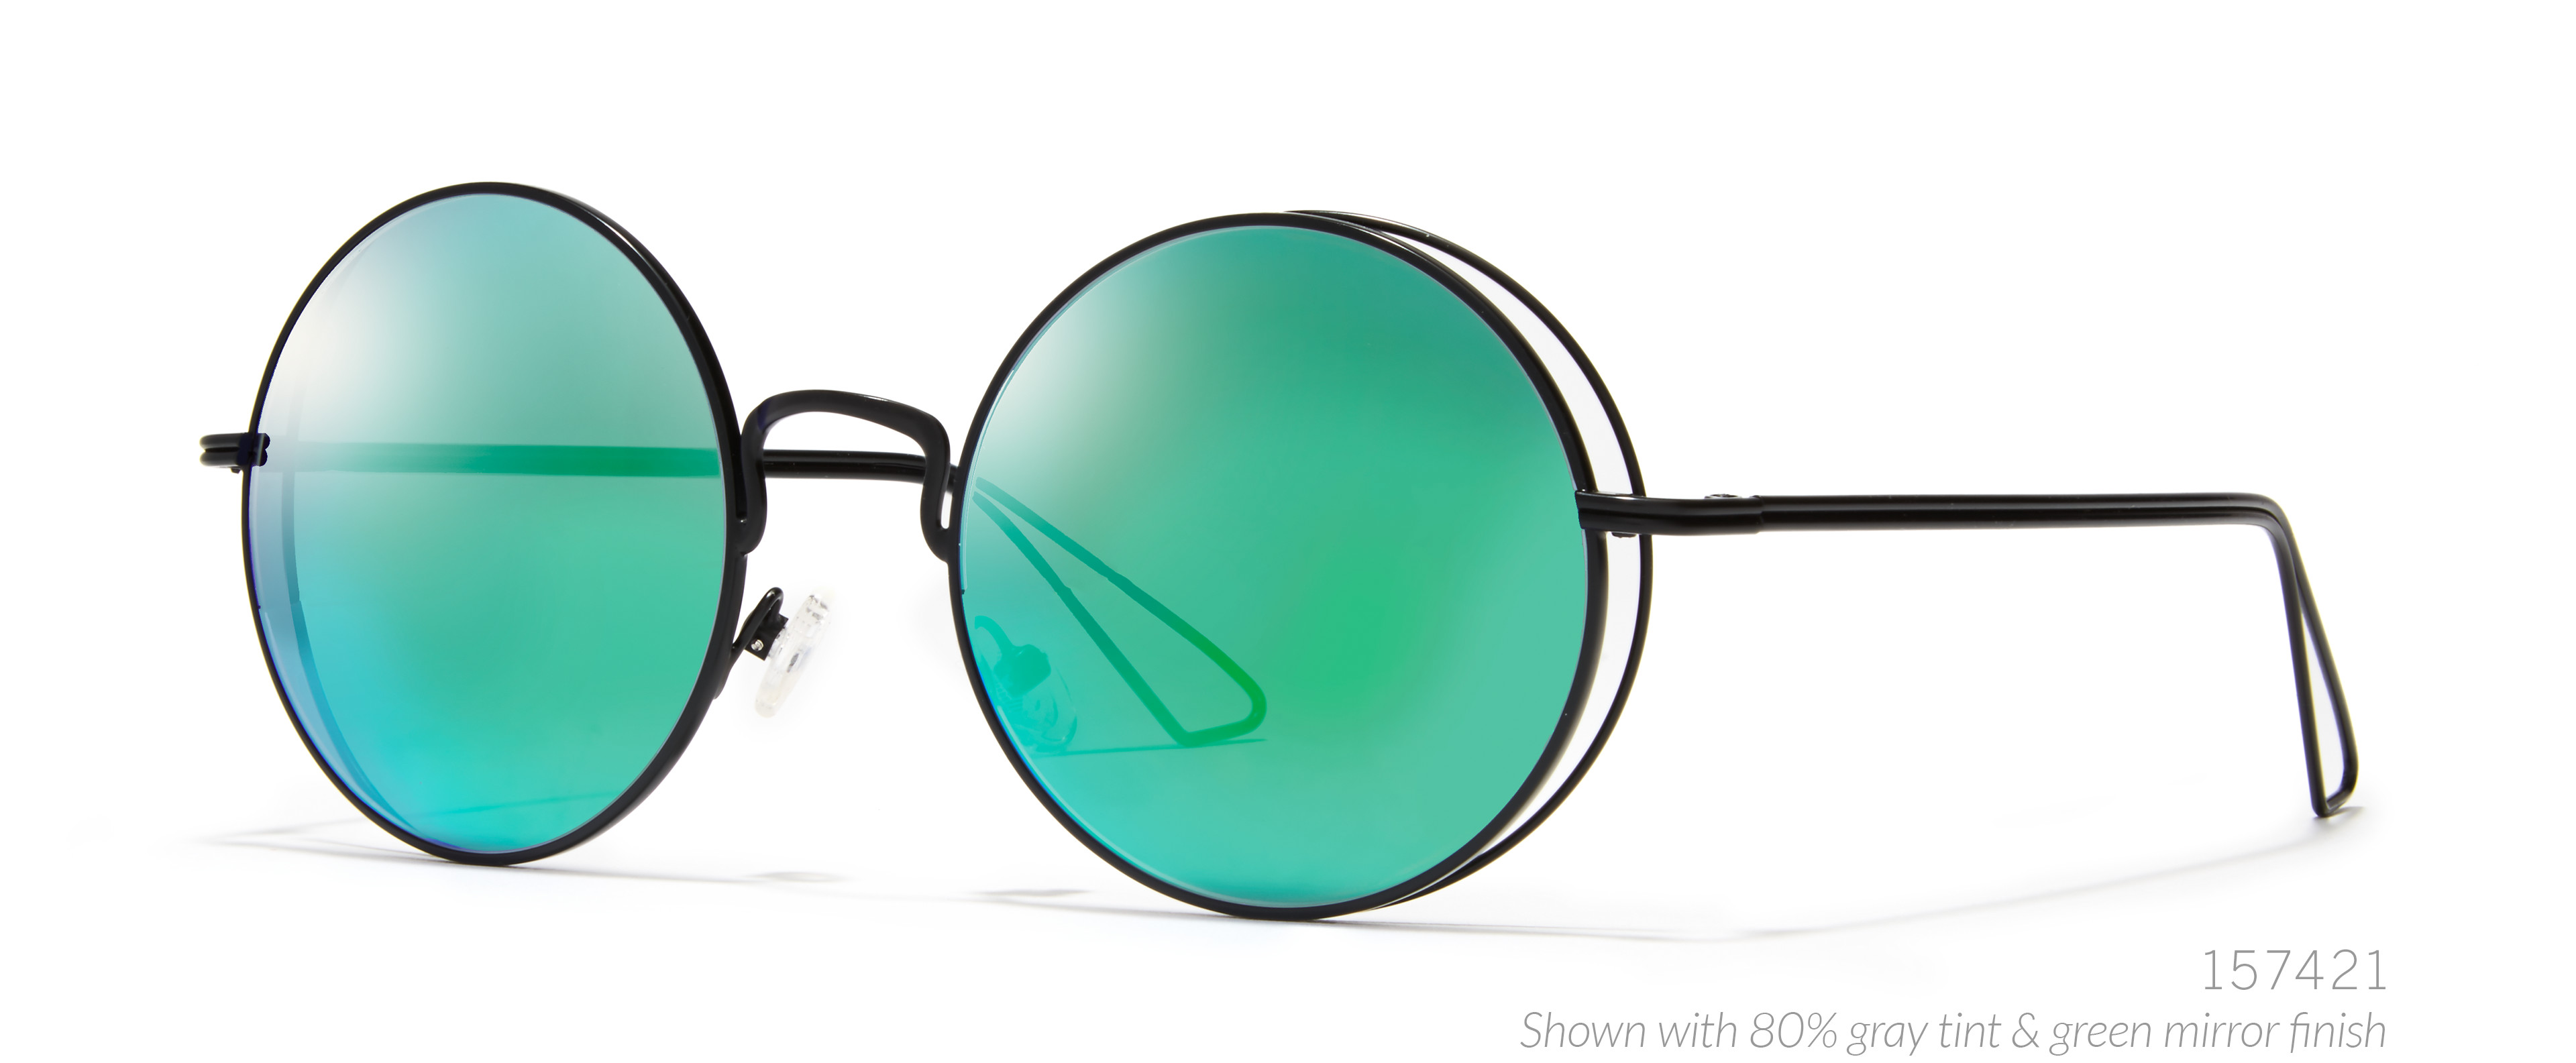 round sunglasses green mirror tint